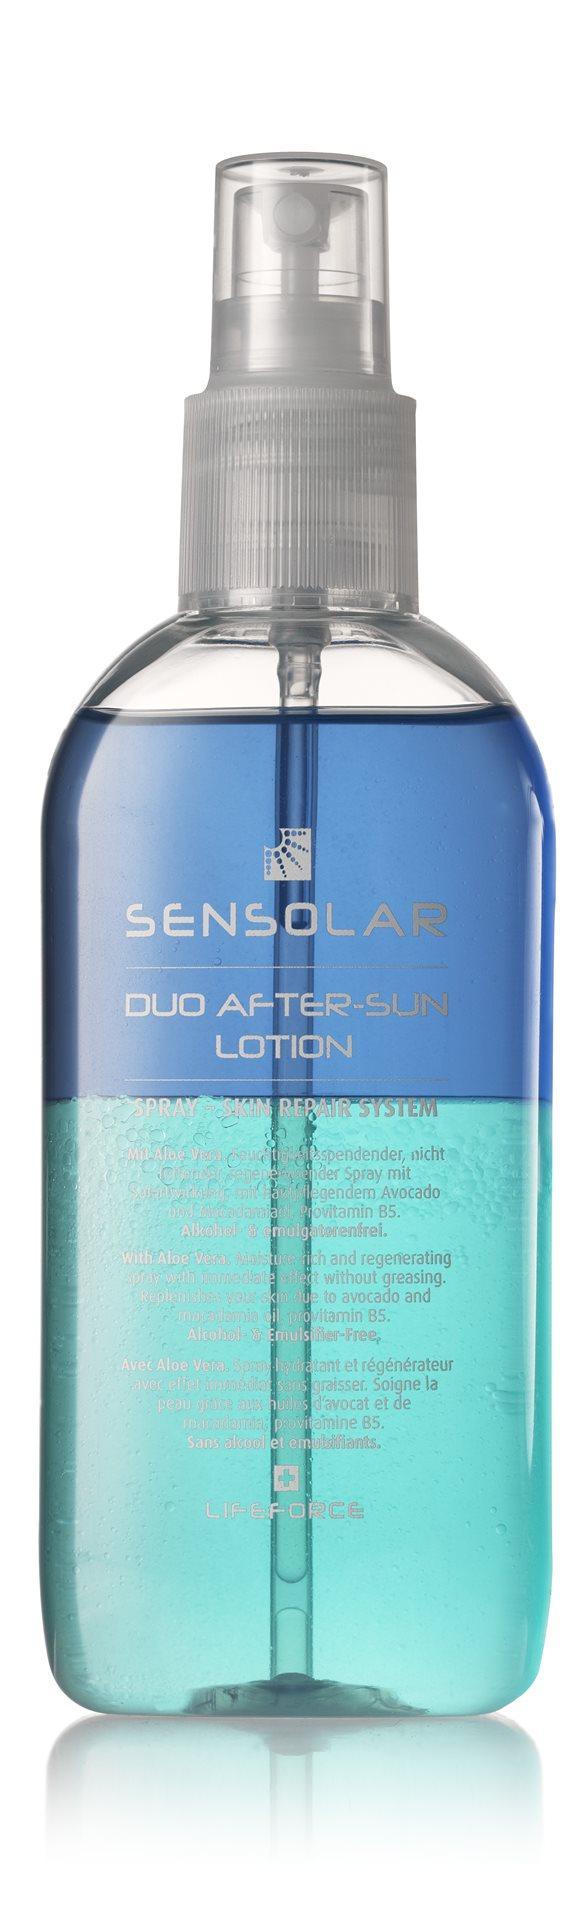 SENSOLAR After Sun Lotion o Emulgator Spray 200 ml